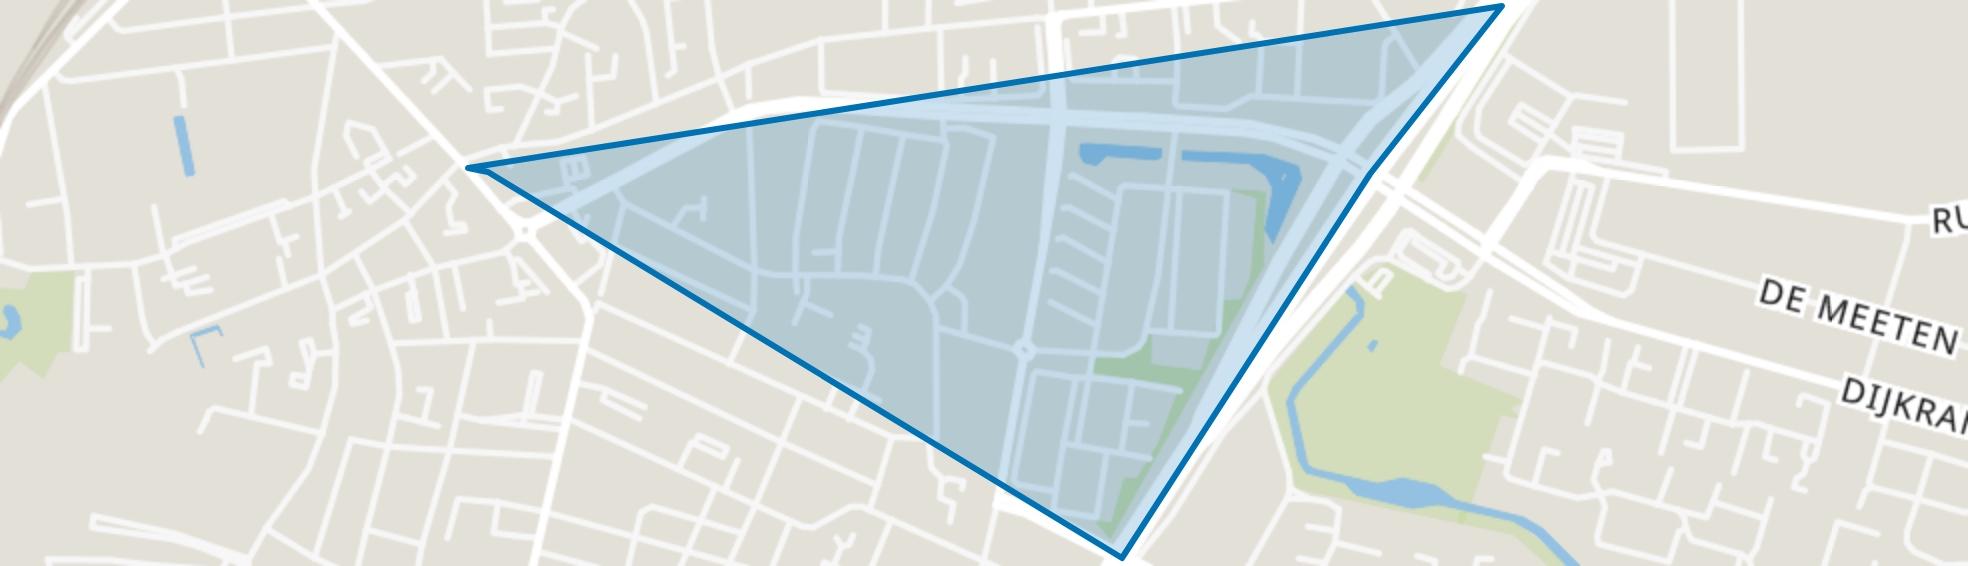 Fatima-villapark, Roosendaal map